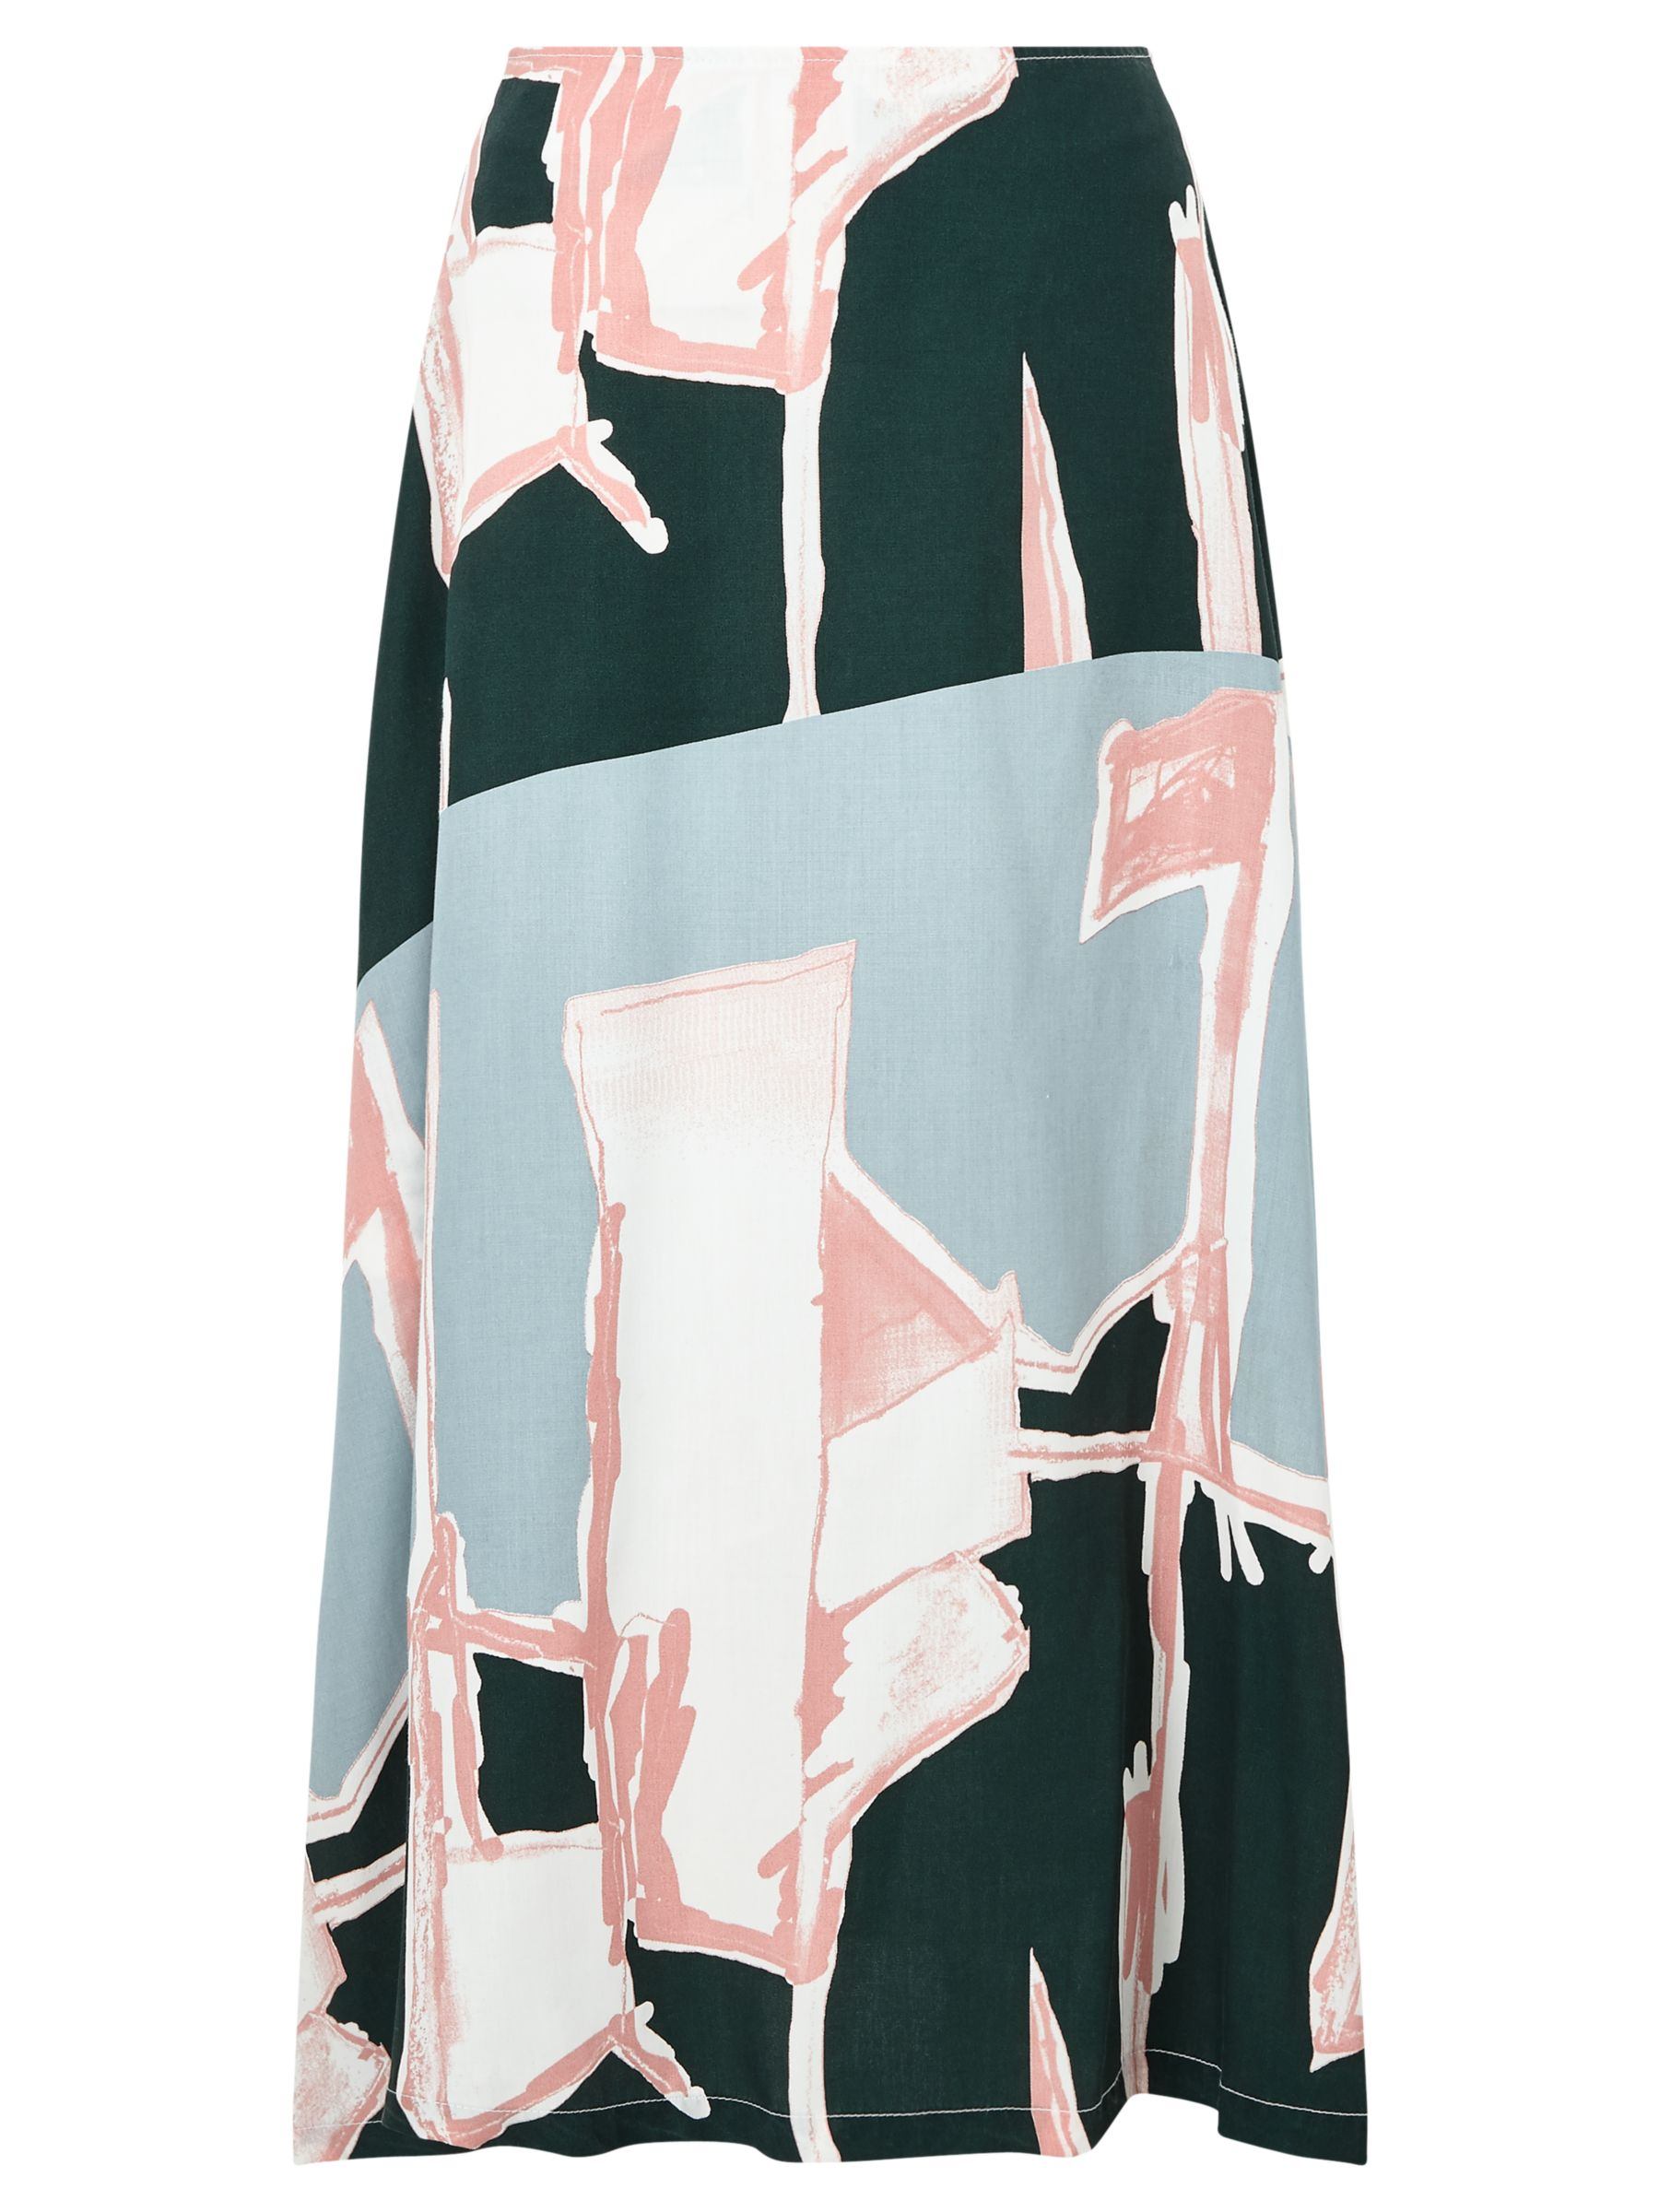 Waven Waven Lilli Printed Skirt, Broken Line Print